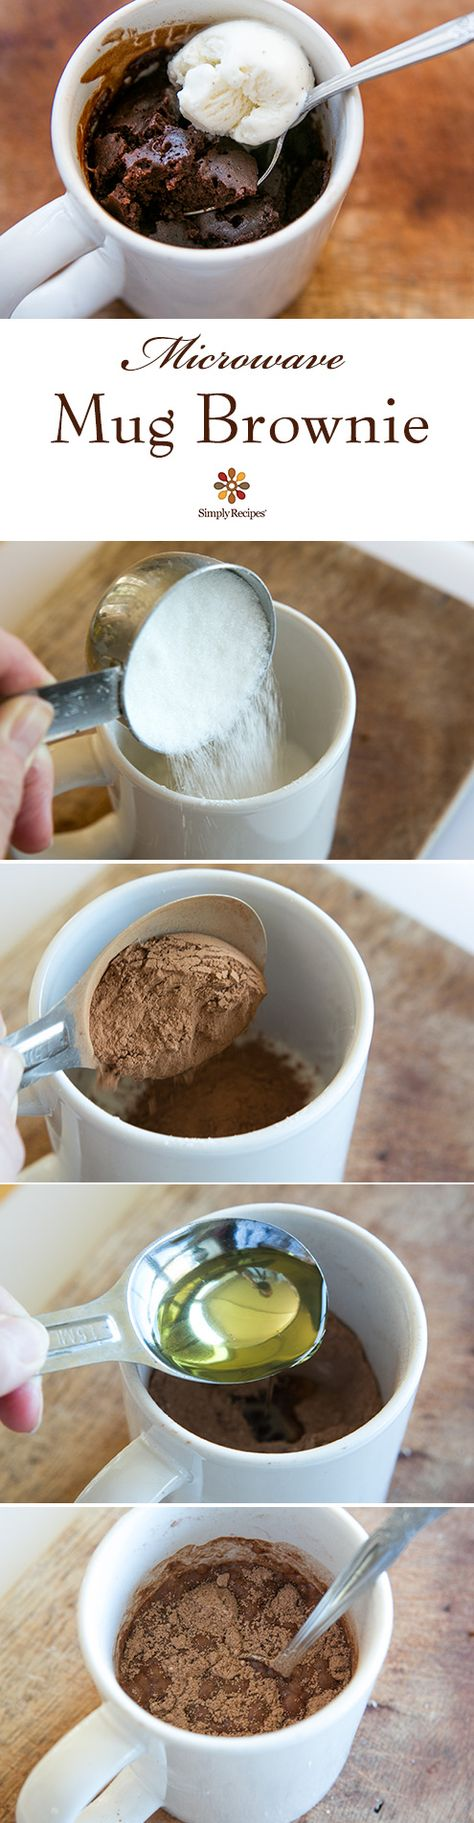 Easiest brownie ever, a single serving brownie microwaved in a mug. On SimplyRecipes.com